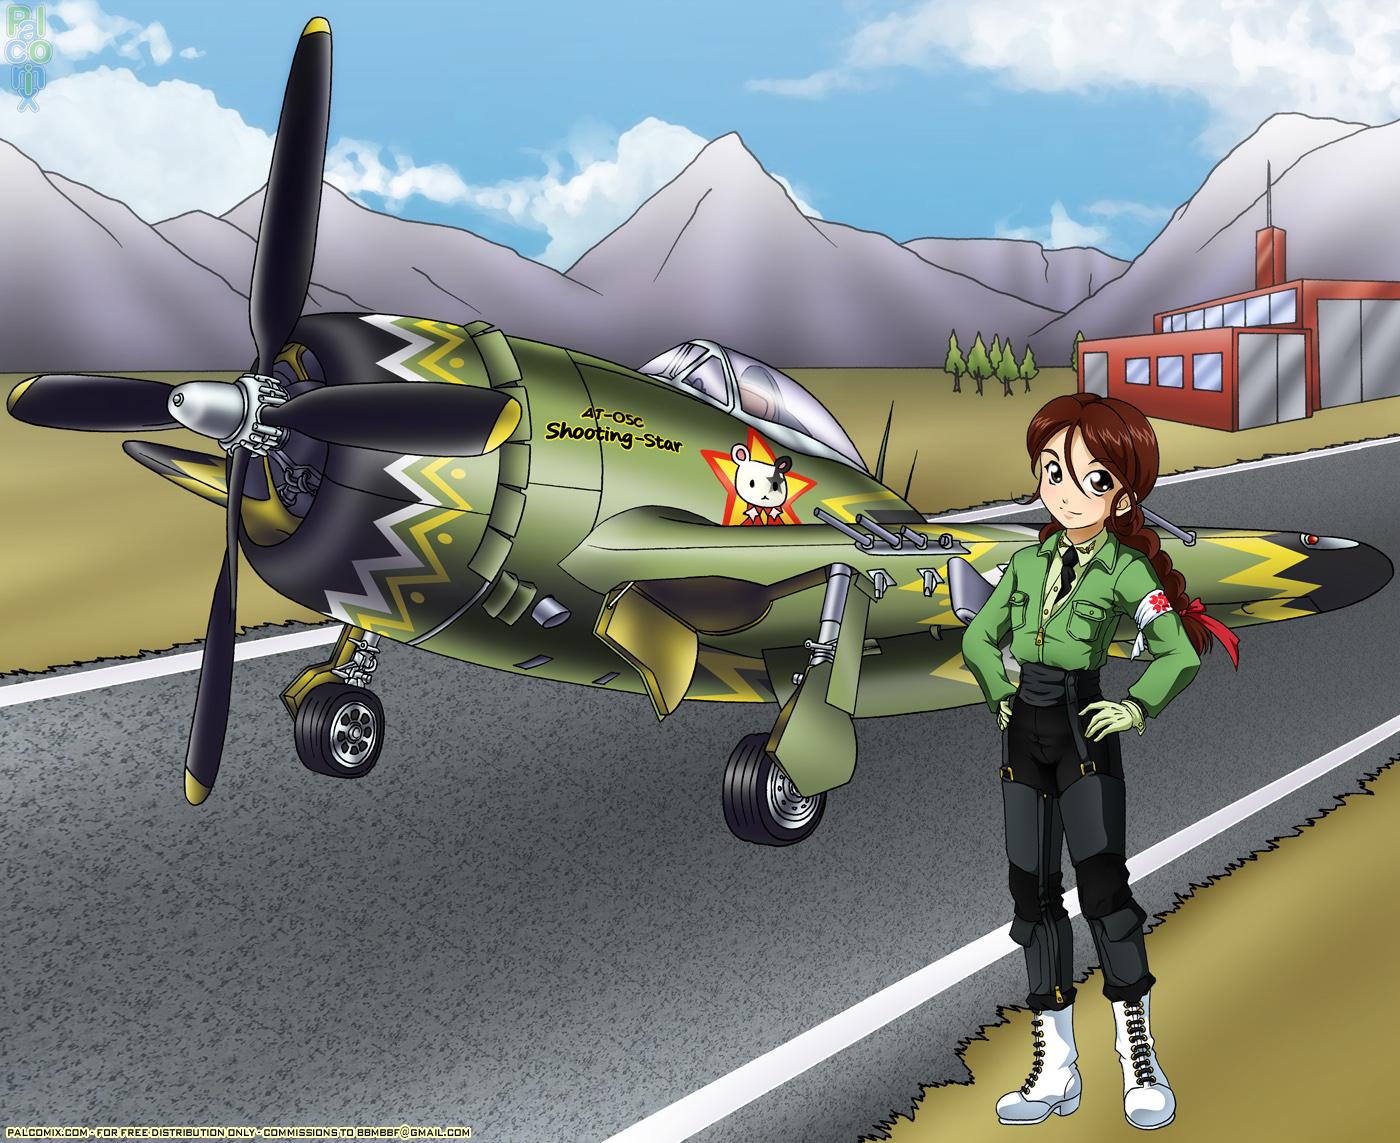 Rikkarita y P-47 by bbmbbf